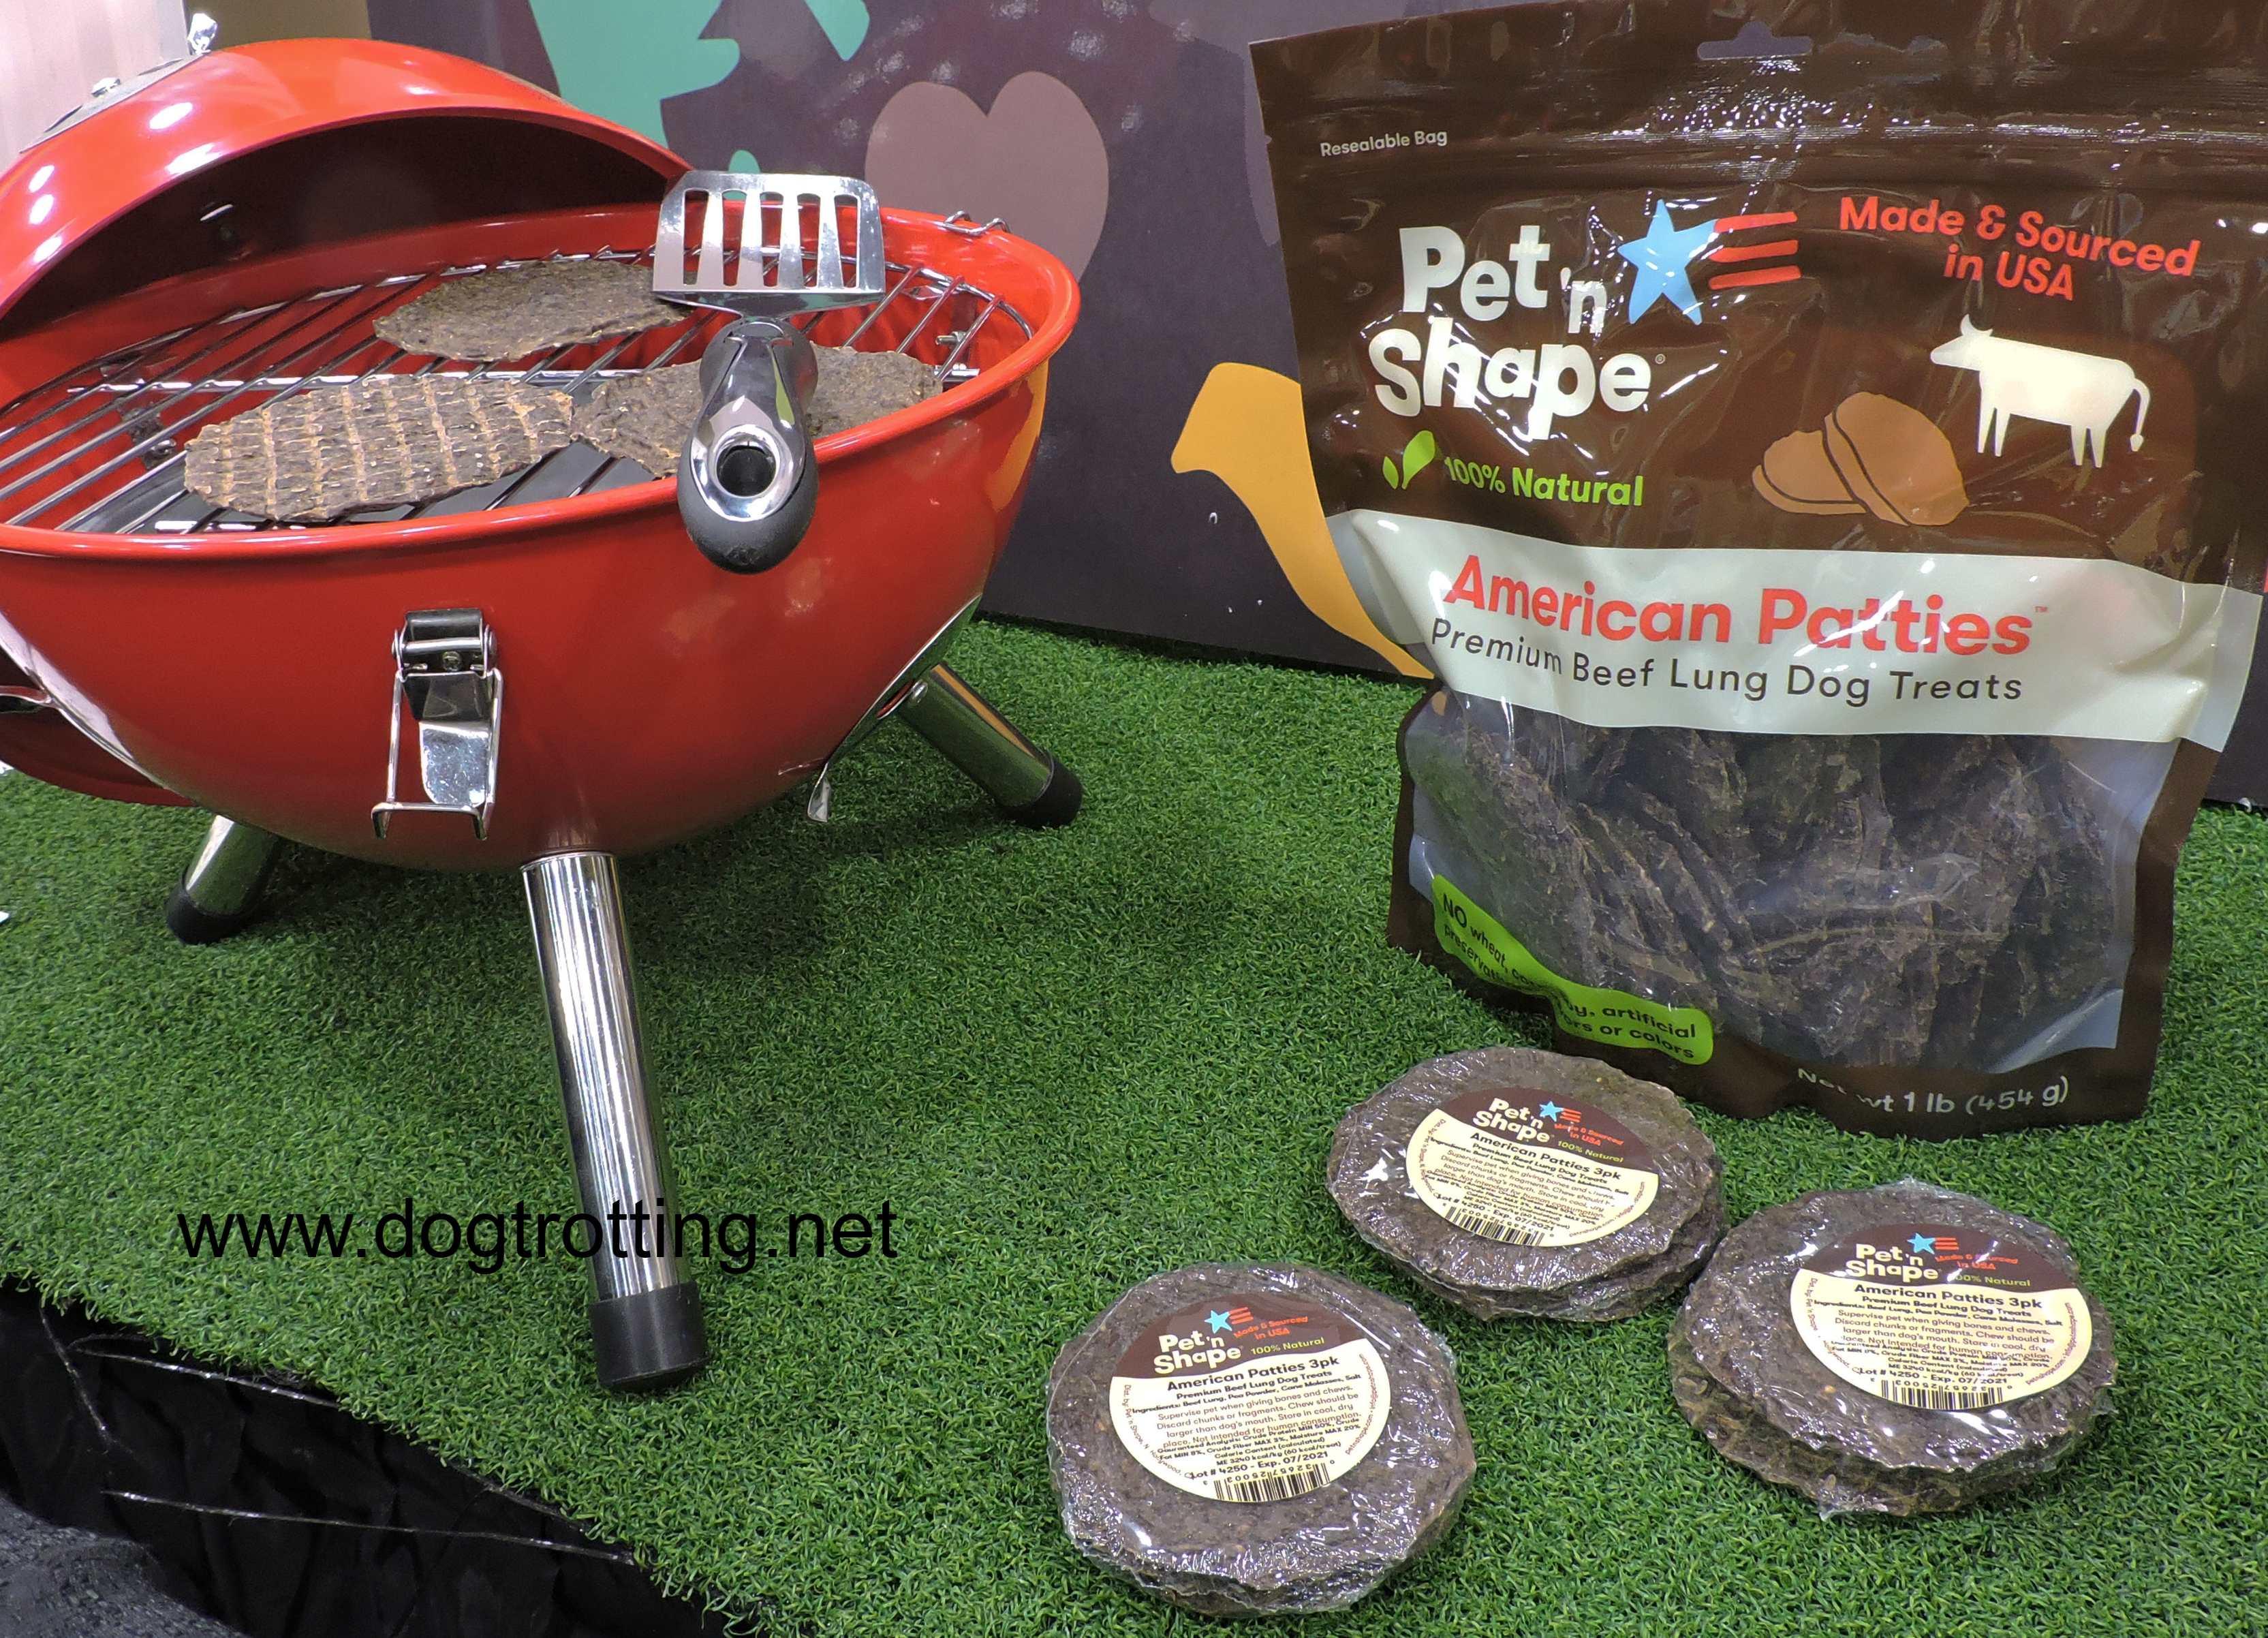 pet n shape American Patties dog treats